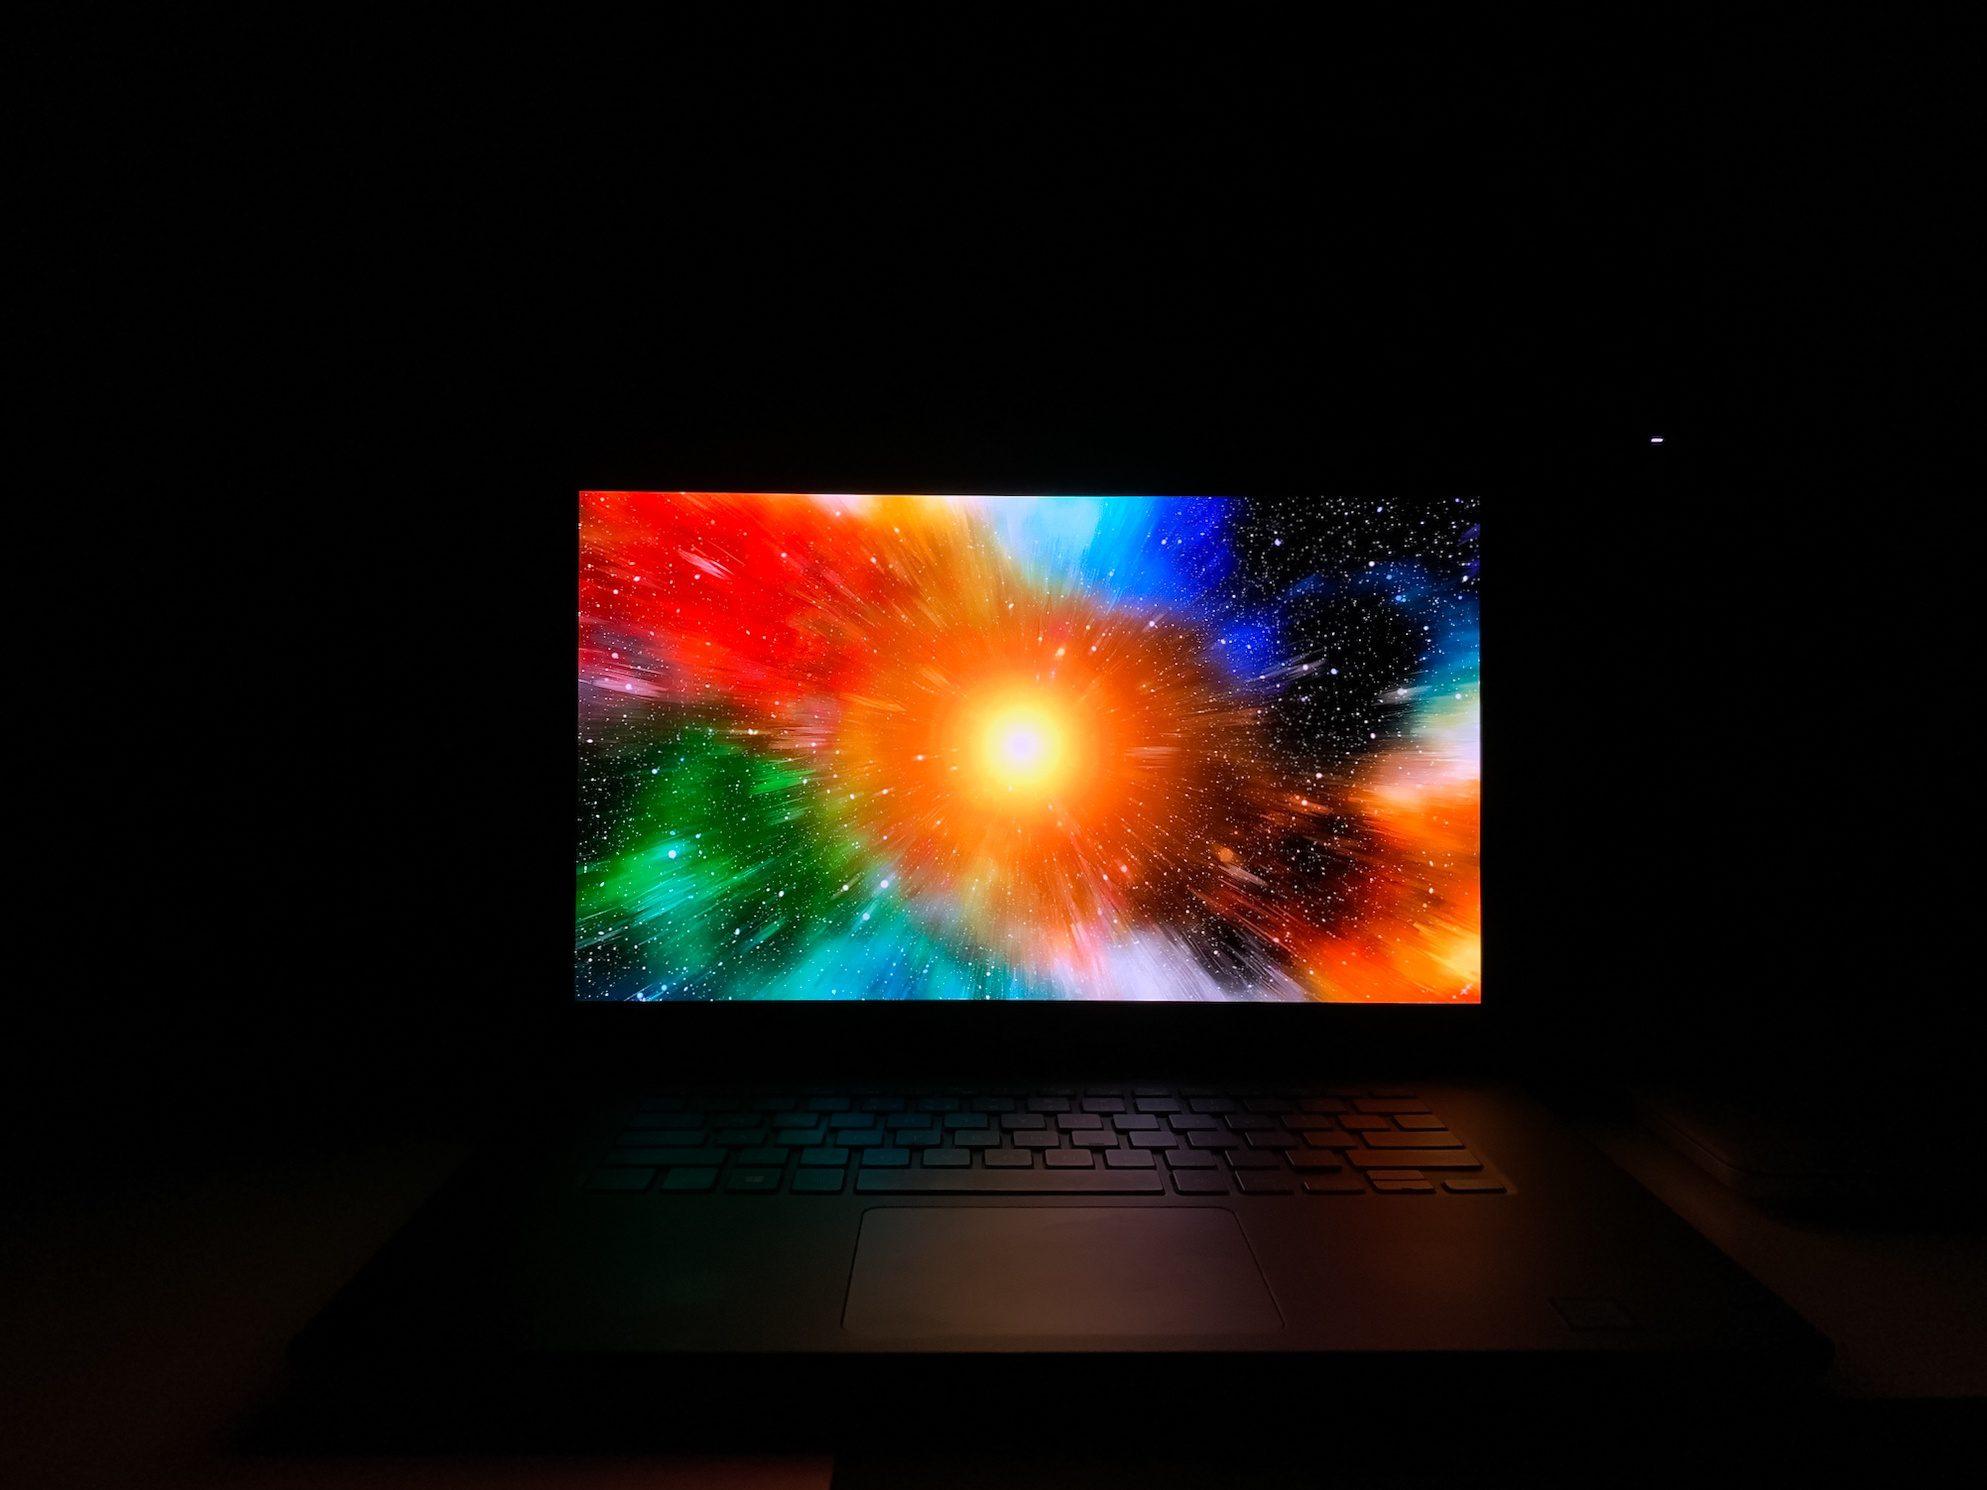 xps 15 oled kolory w nocy